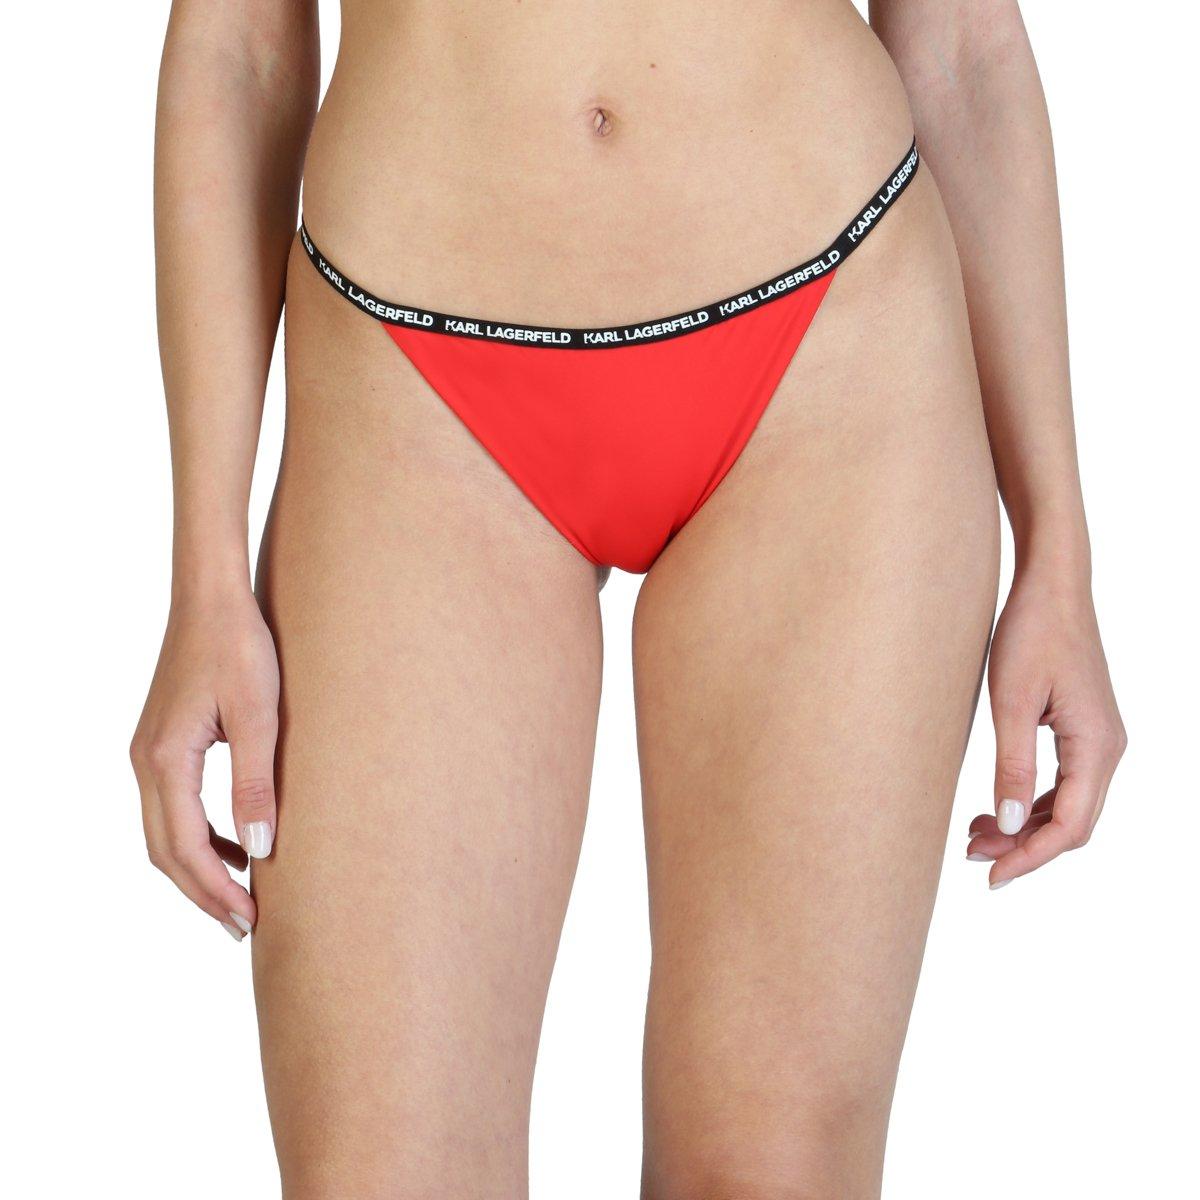 Karl Lagerfeld Women's Swimwear Underwear Various Colours KL21WBT01 - red XS